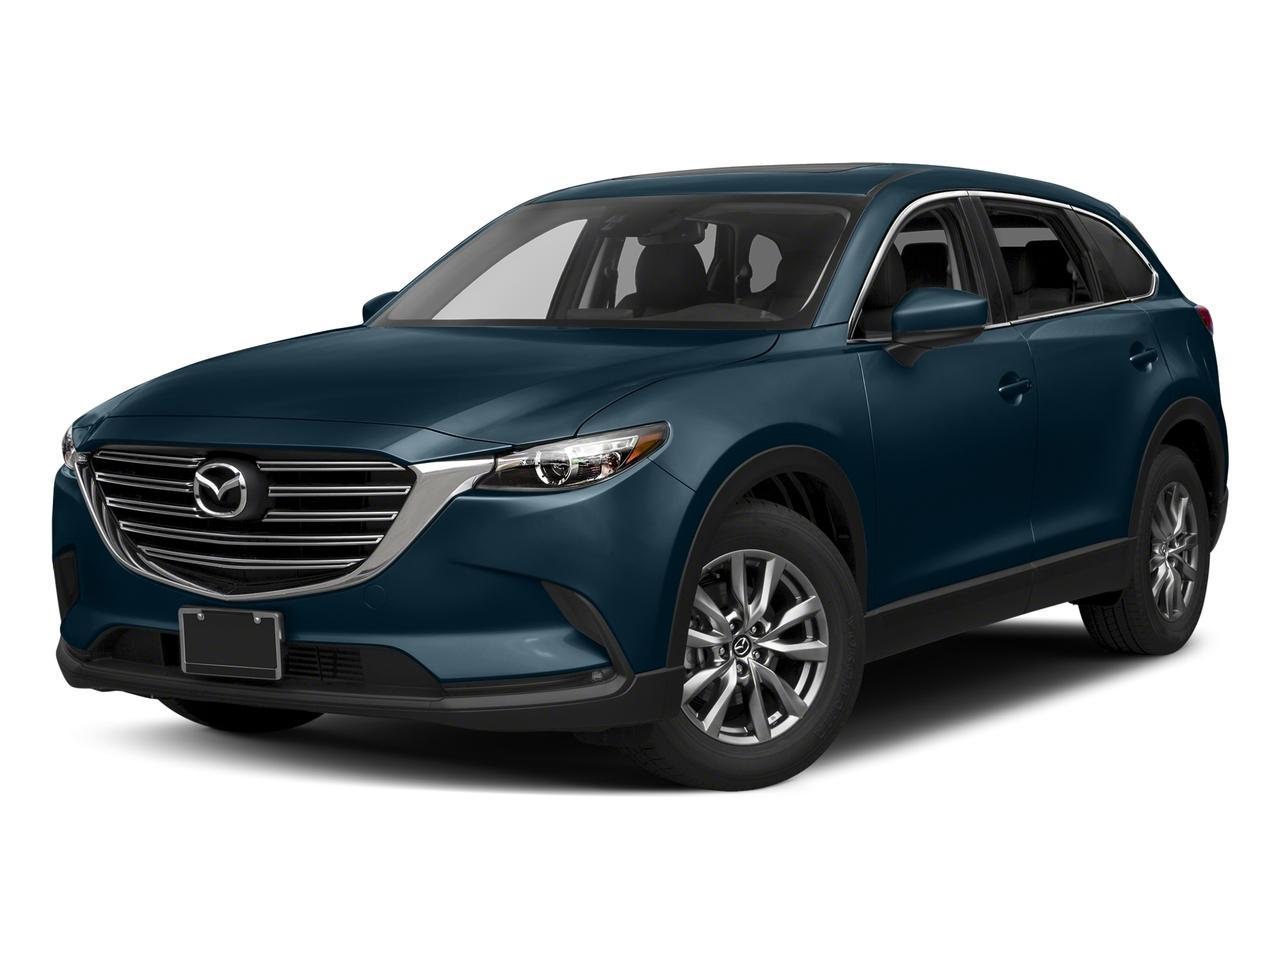 2017 Mazda CX-9 Vehicle Photo in San Angelo, TX 76901